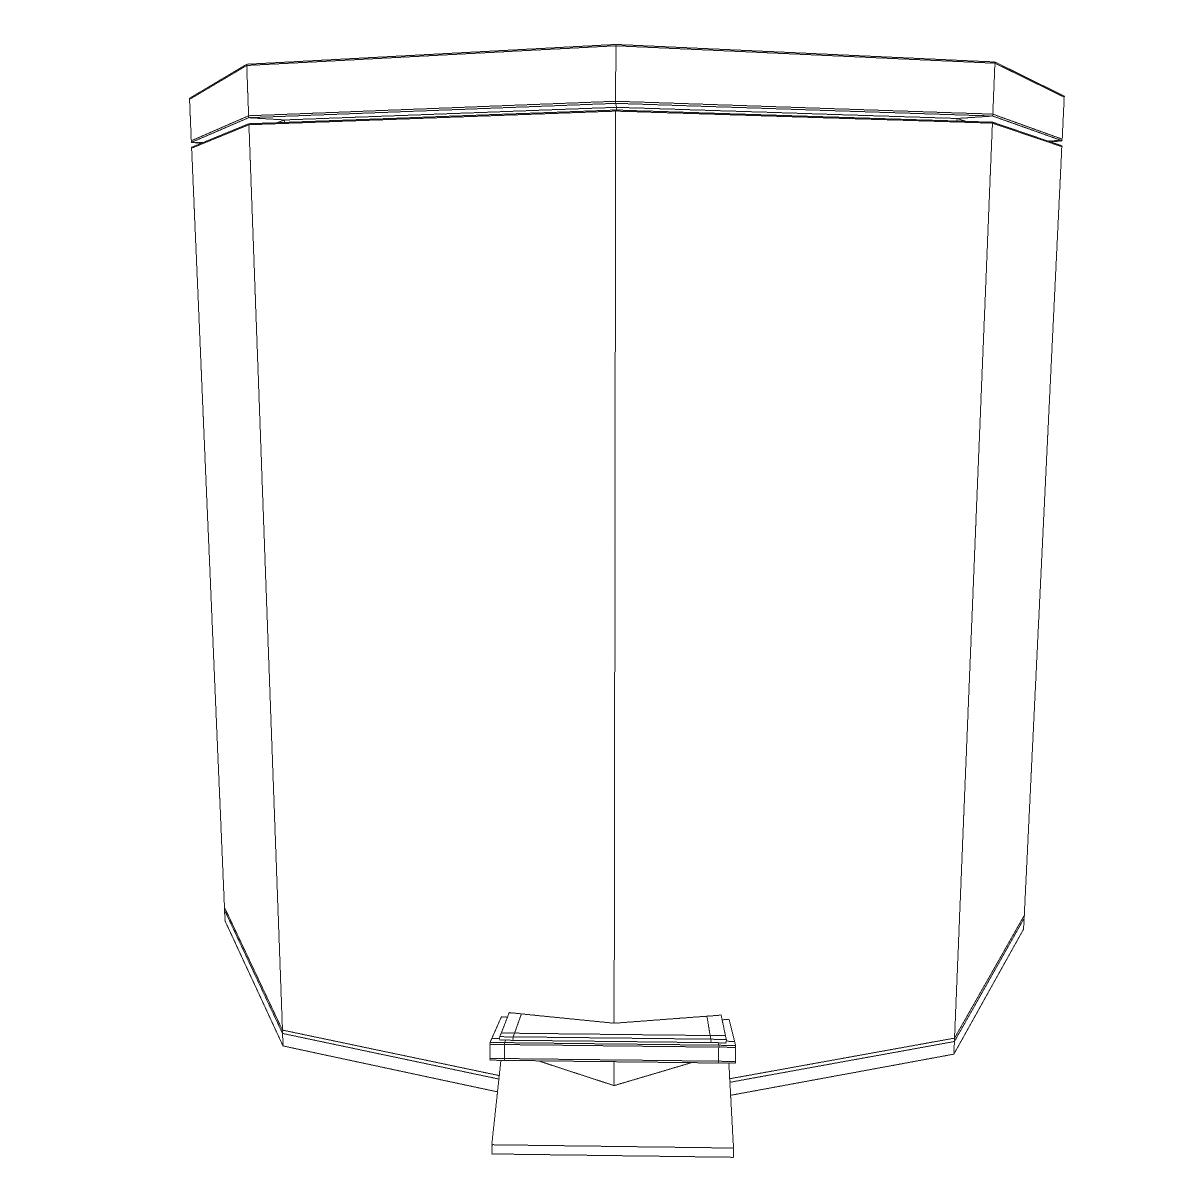 bathroom dumpster 3d model 3ds max fbx ma mb obj 155985